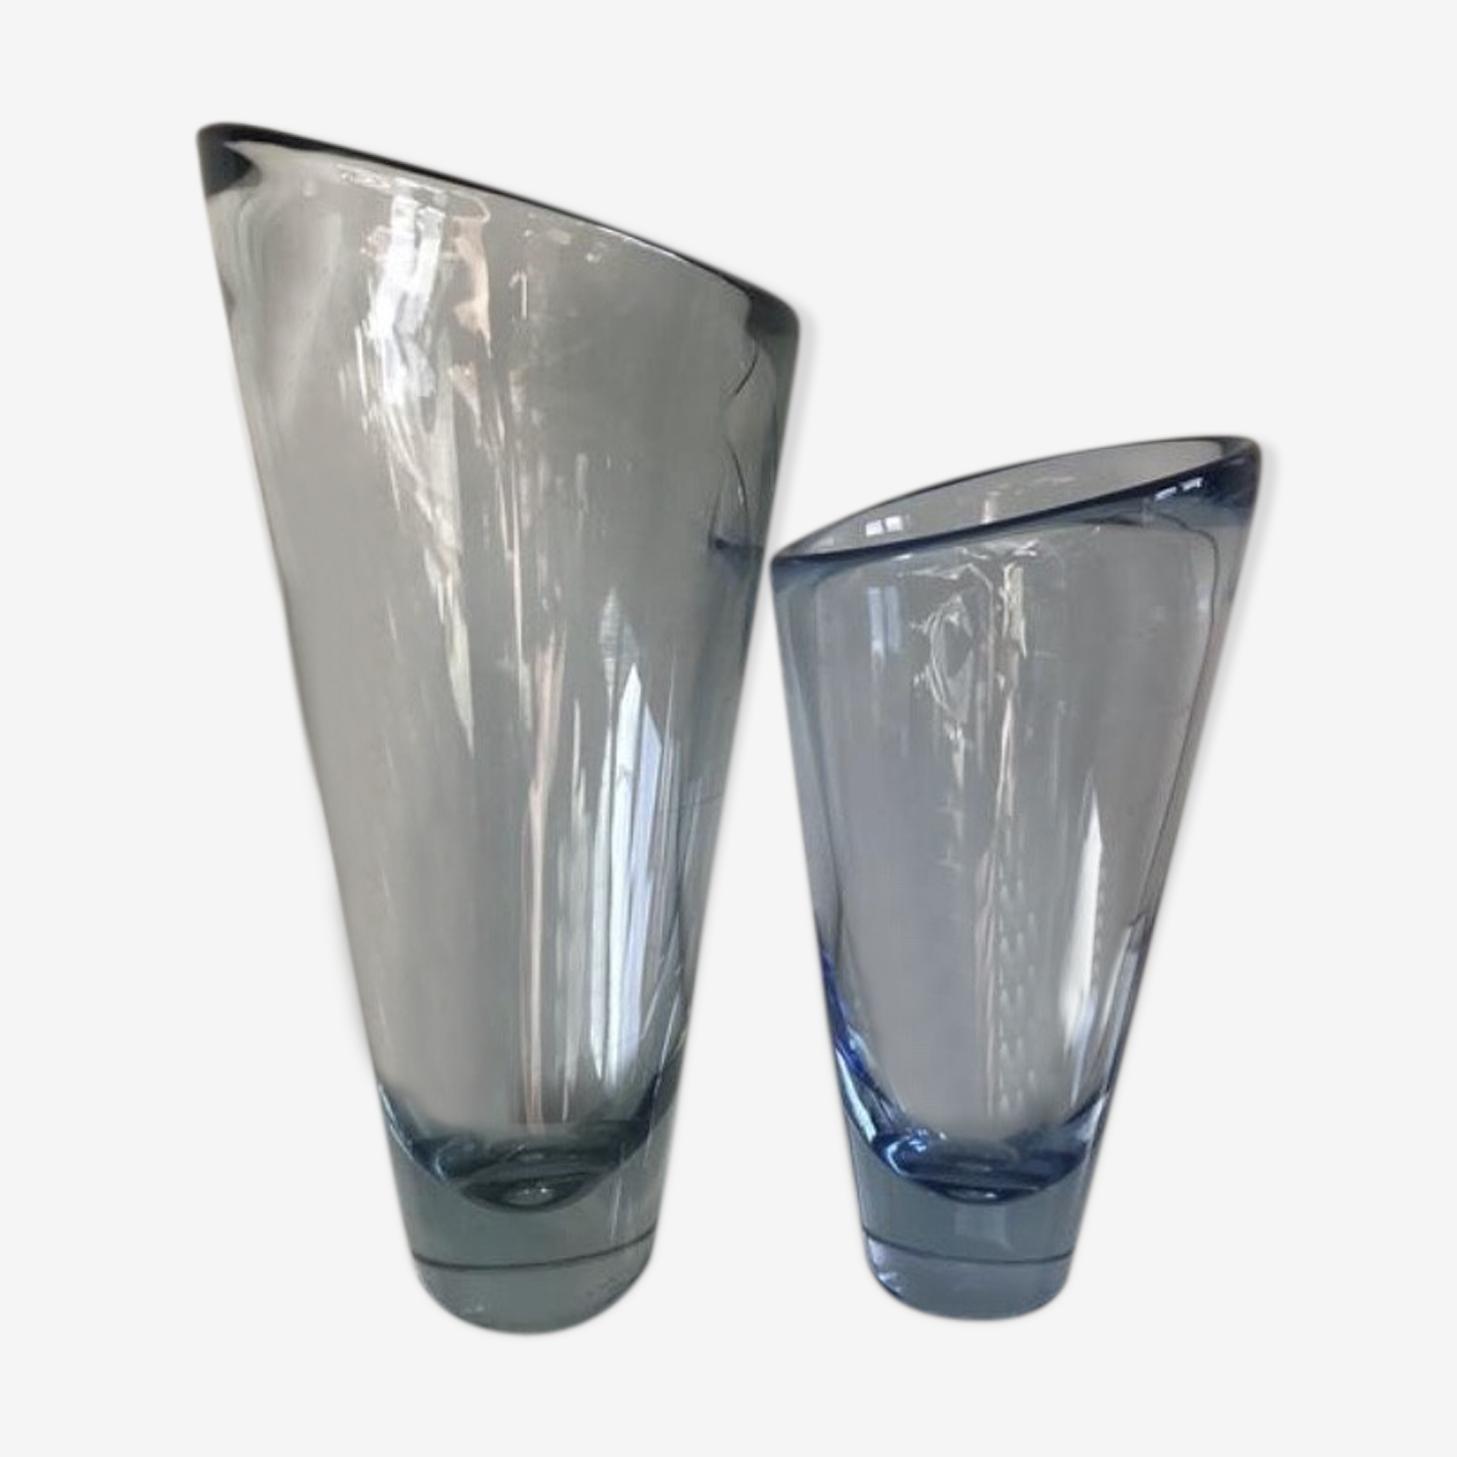 Holmegaard  set of 2 asymetrical vases  by Per Lutken